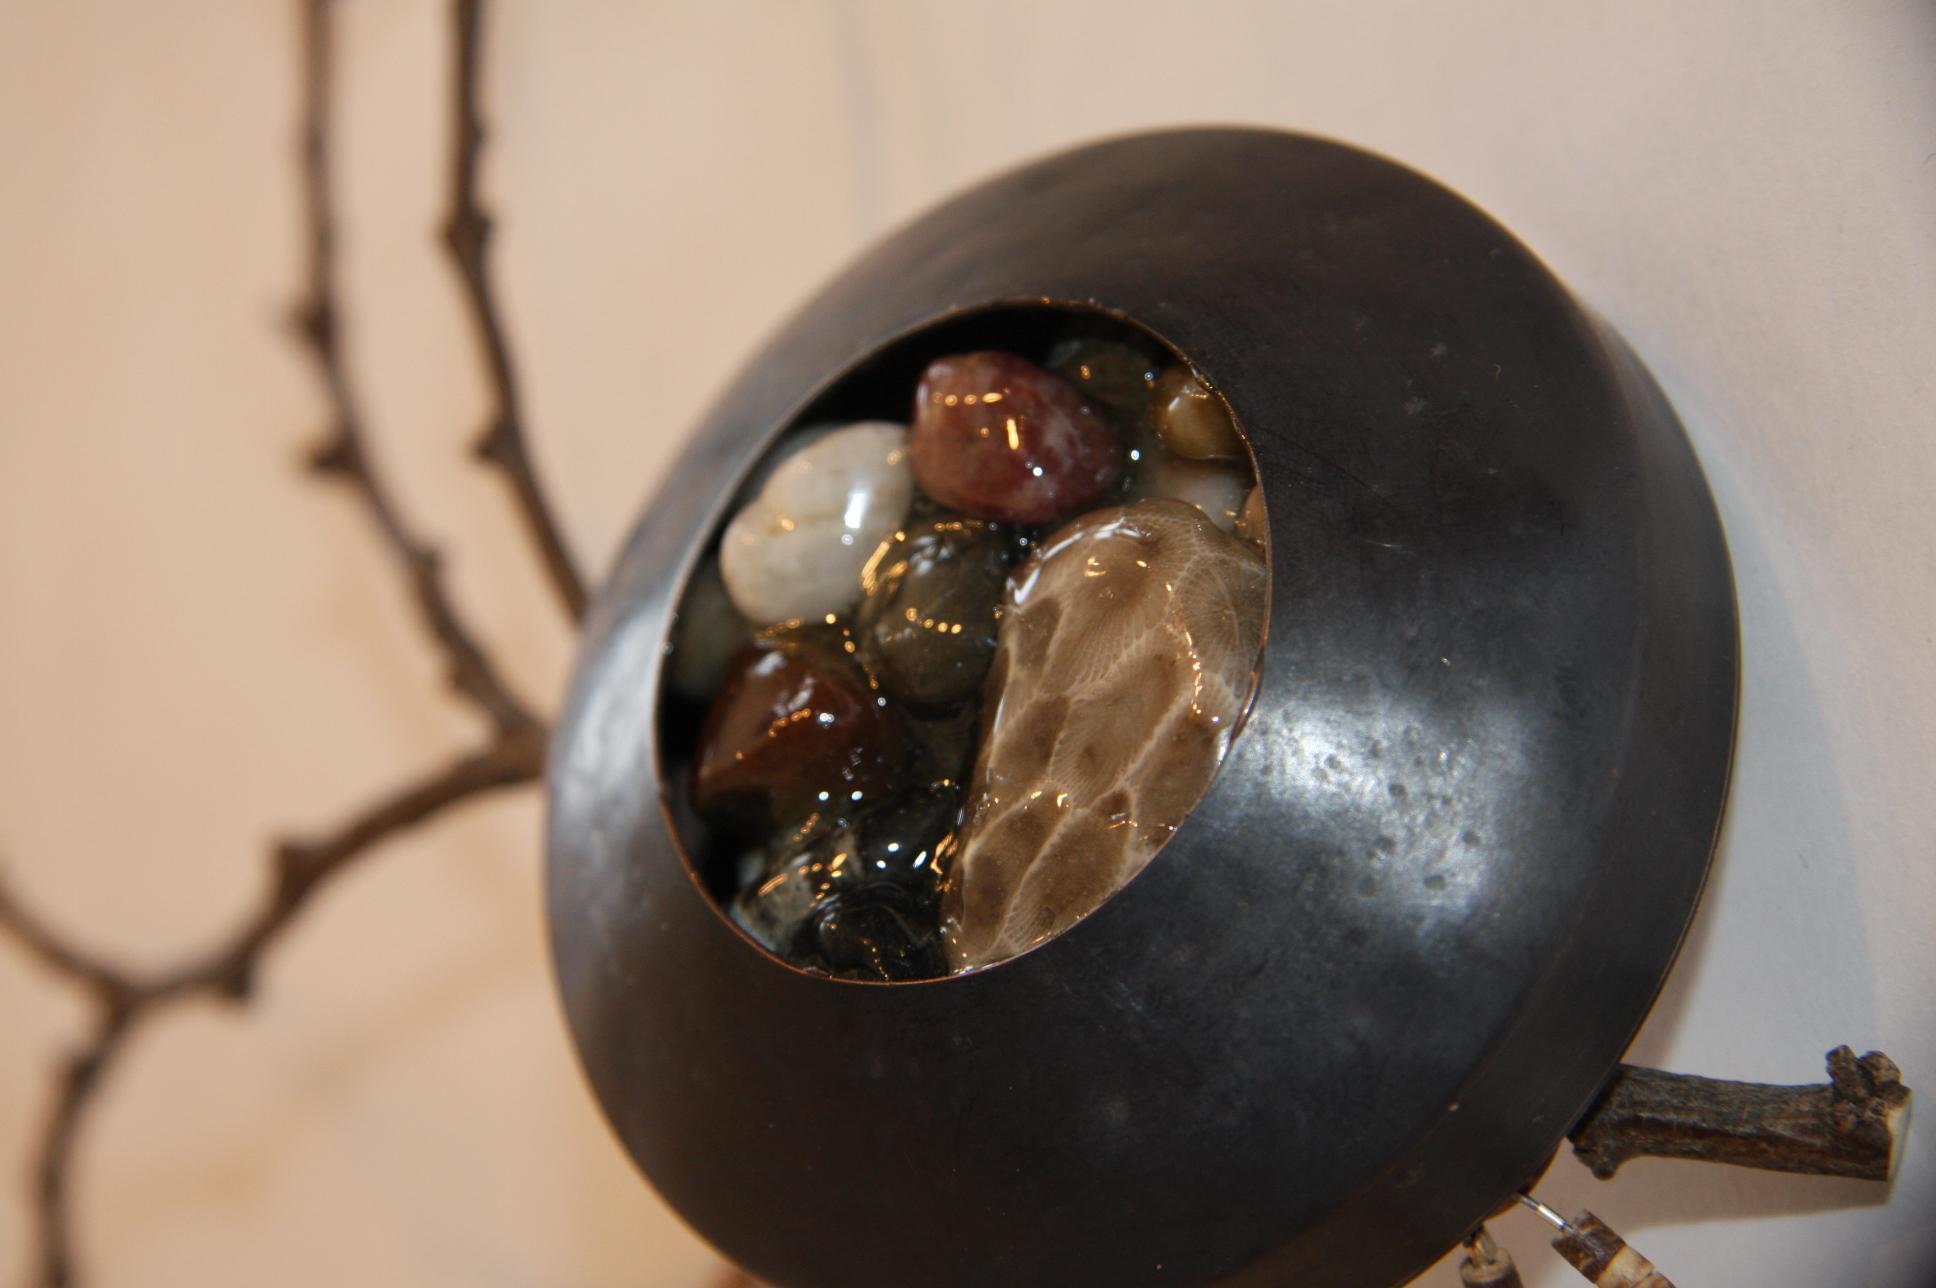 Petoskey Stone Chest Piece - $80.00